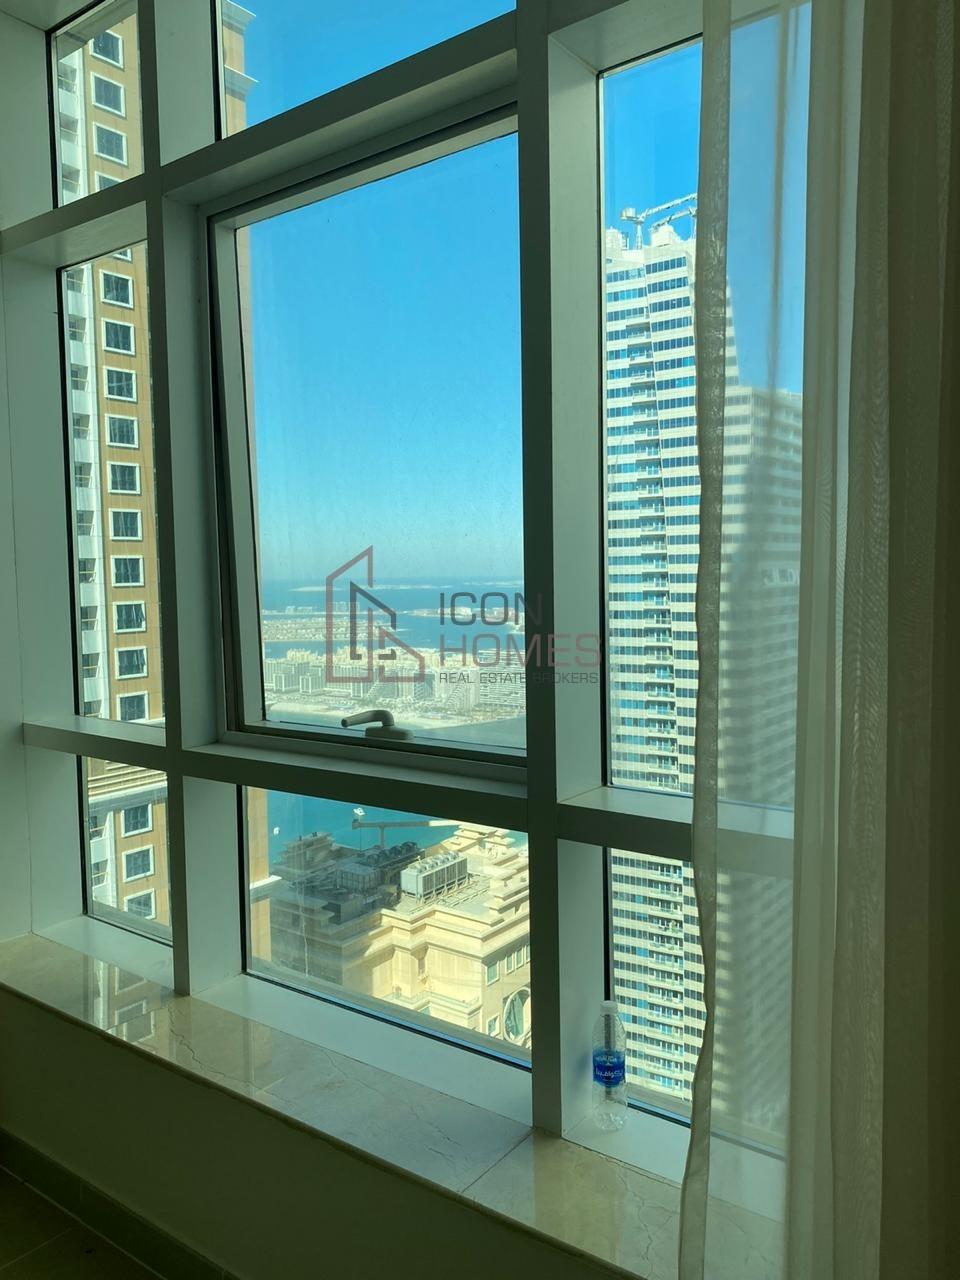 SPACIOUS MARINA VIEWS 3BR, 3 bathrooms, 2 Balconies apartment in MARINA PINNACLE, DUBAI MARINA - 95K!